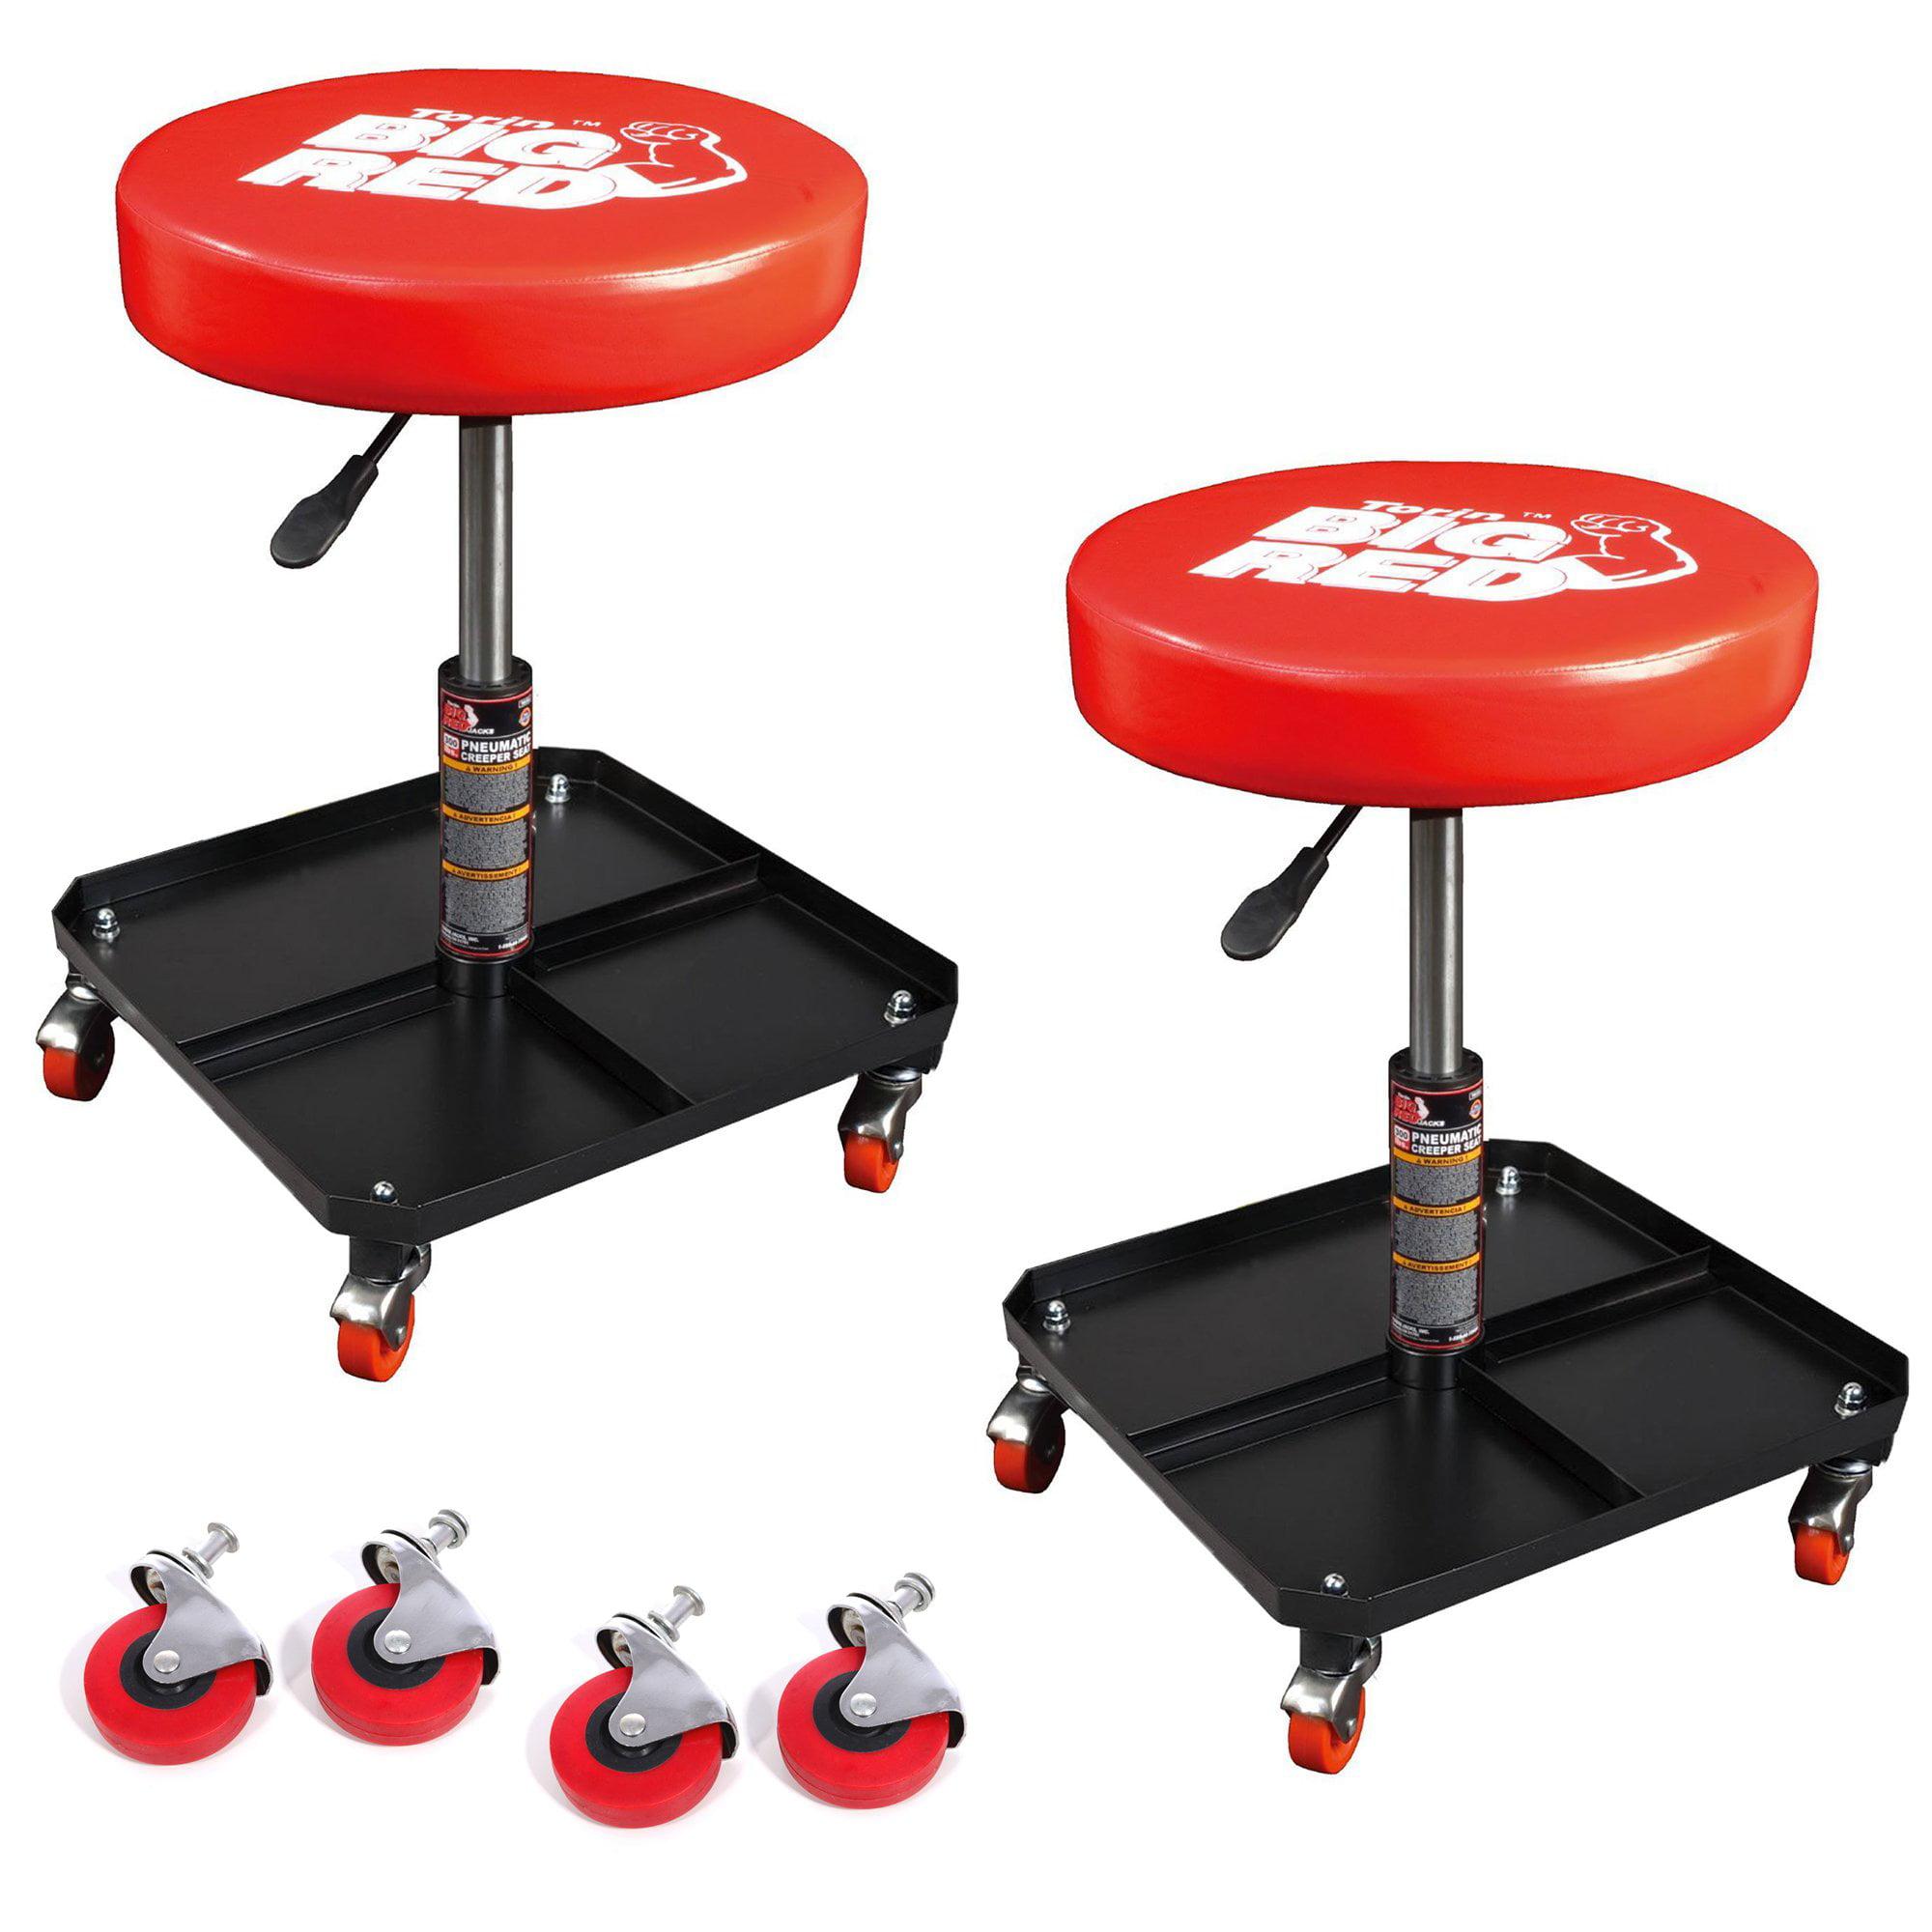 Torin Big Red Pneumatic Creeper Garage Mechanic Padded Stool (2 Pack) & Wheels by Torin